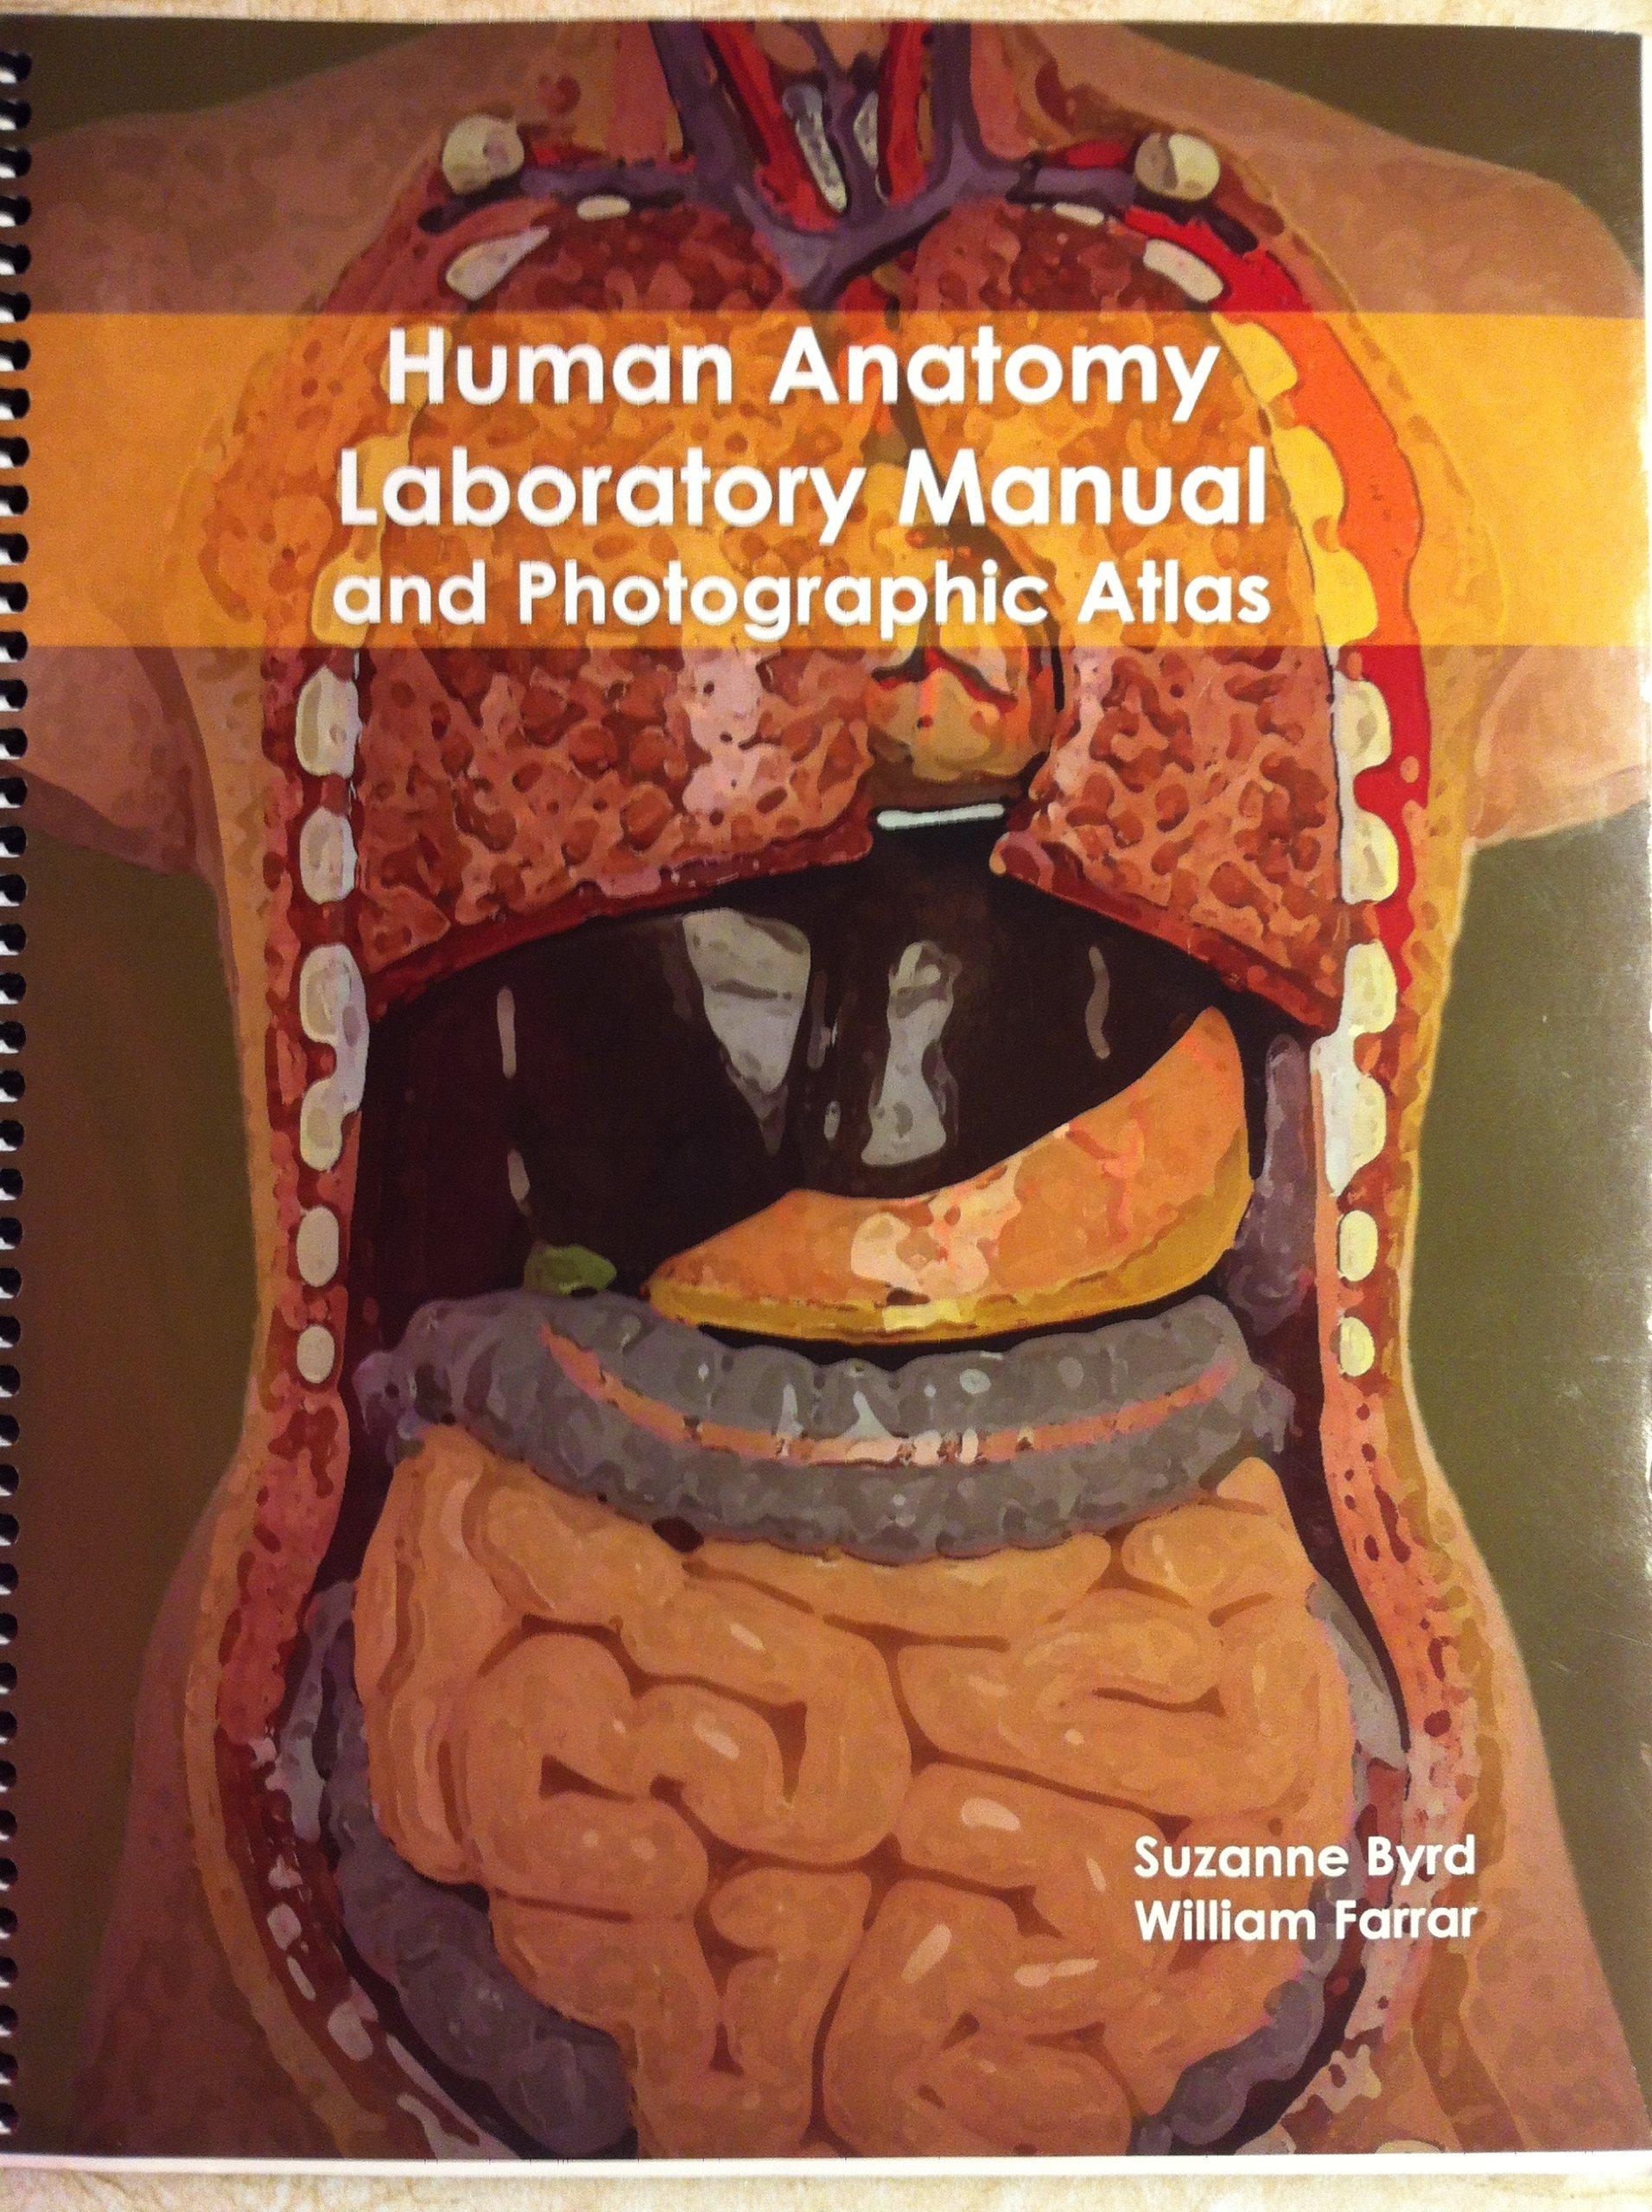 Human Anatomy Laboratory Manual and Photographic Atlas: Suzanne Byrd,  William Farrar: 9780078041341: Amazon.com: Books